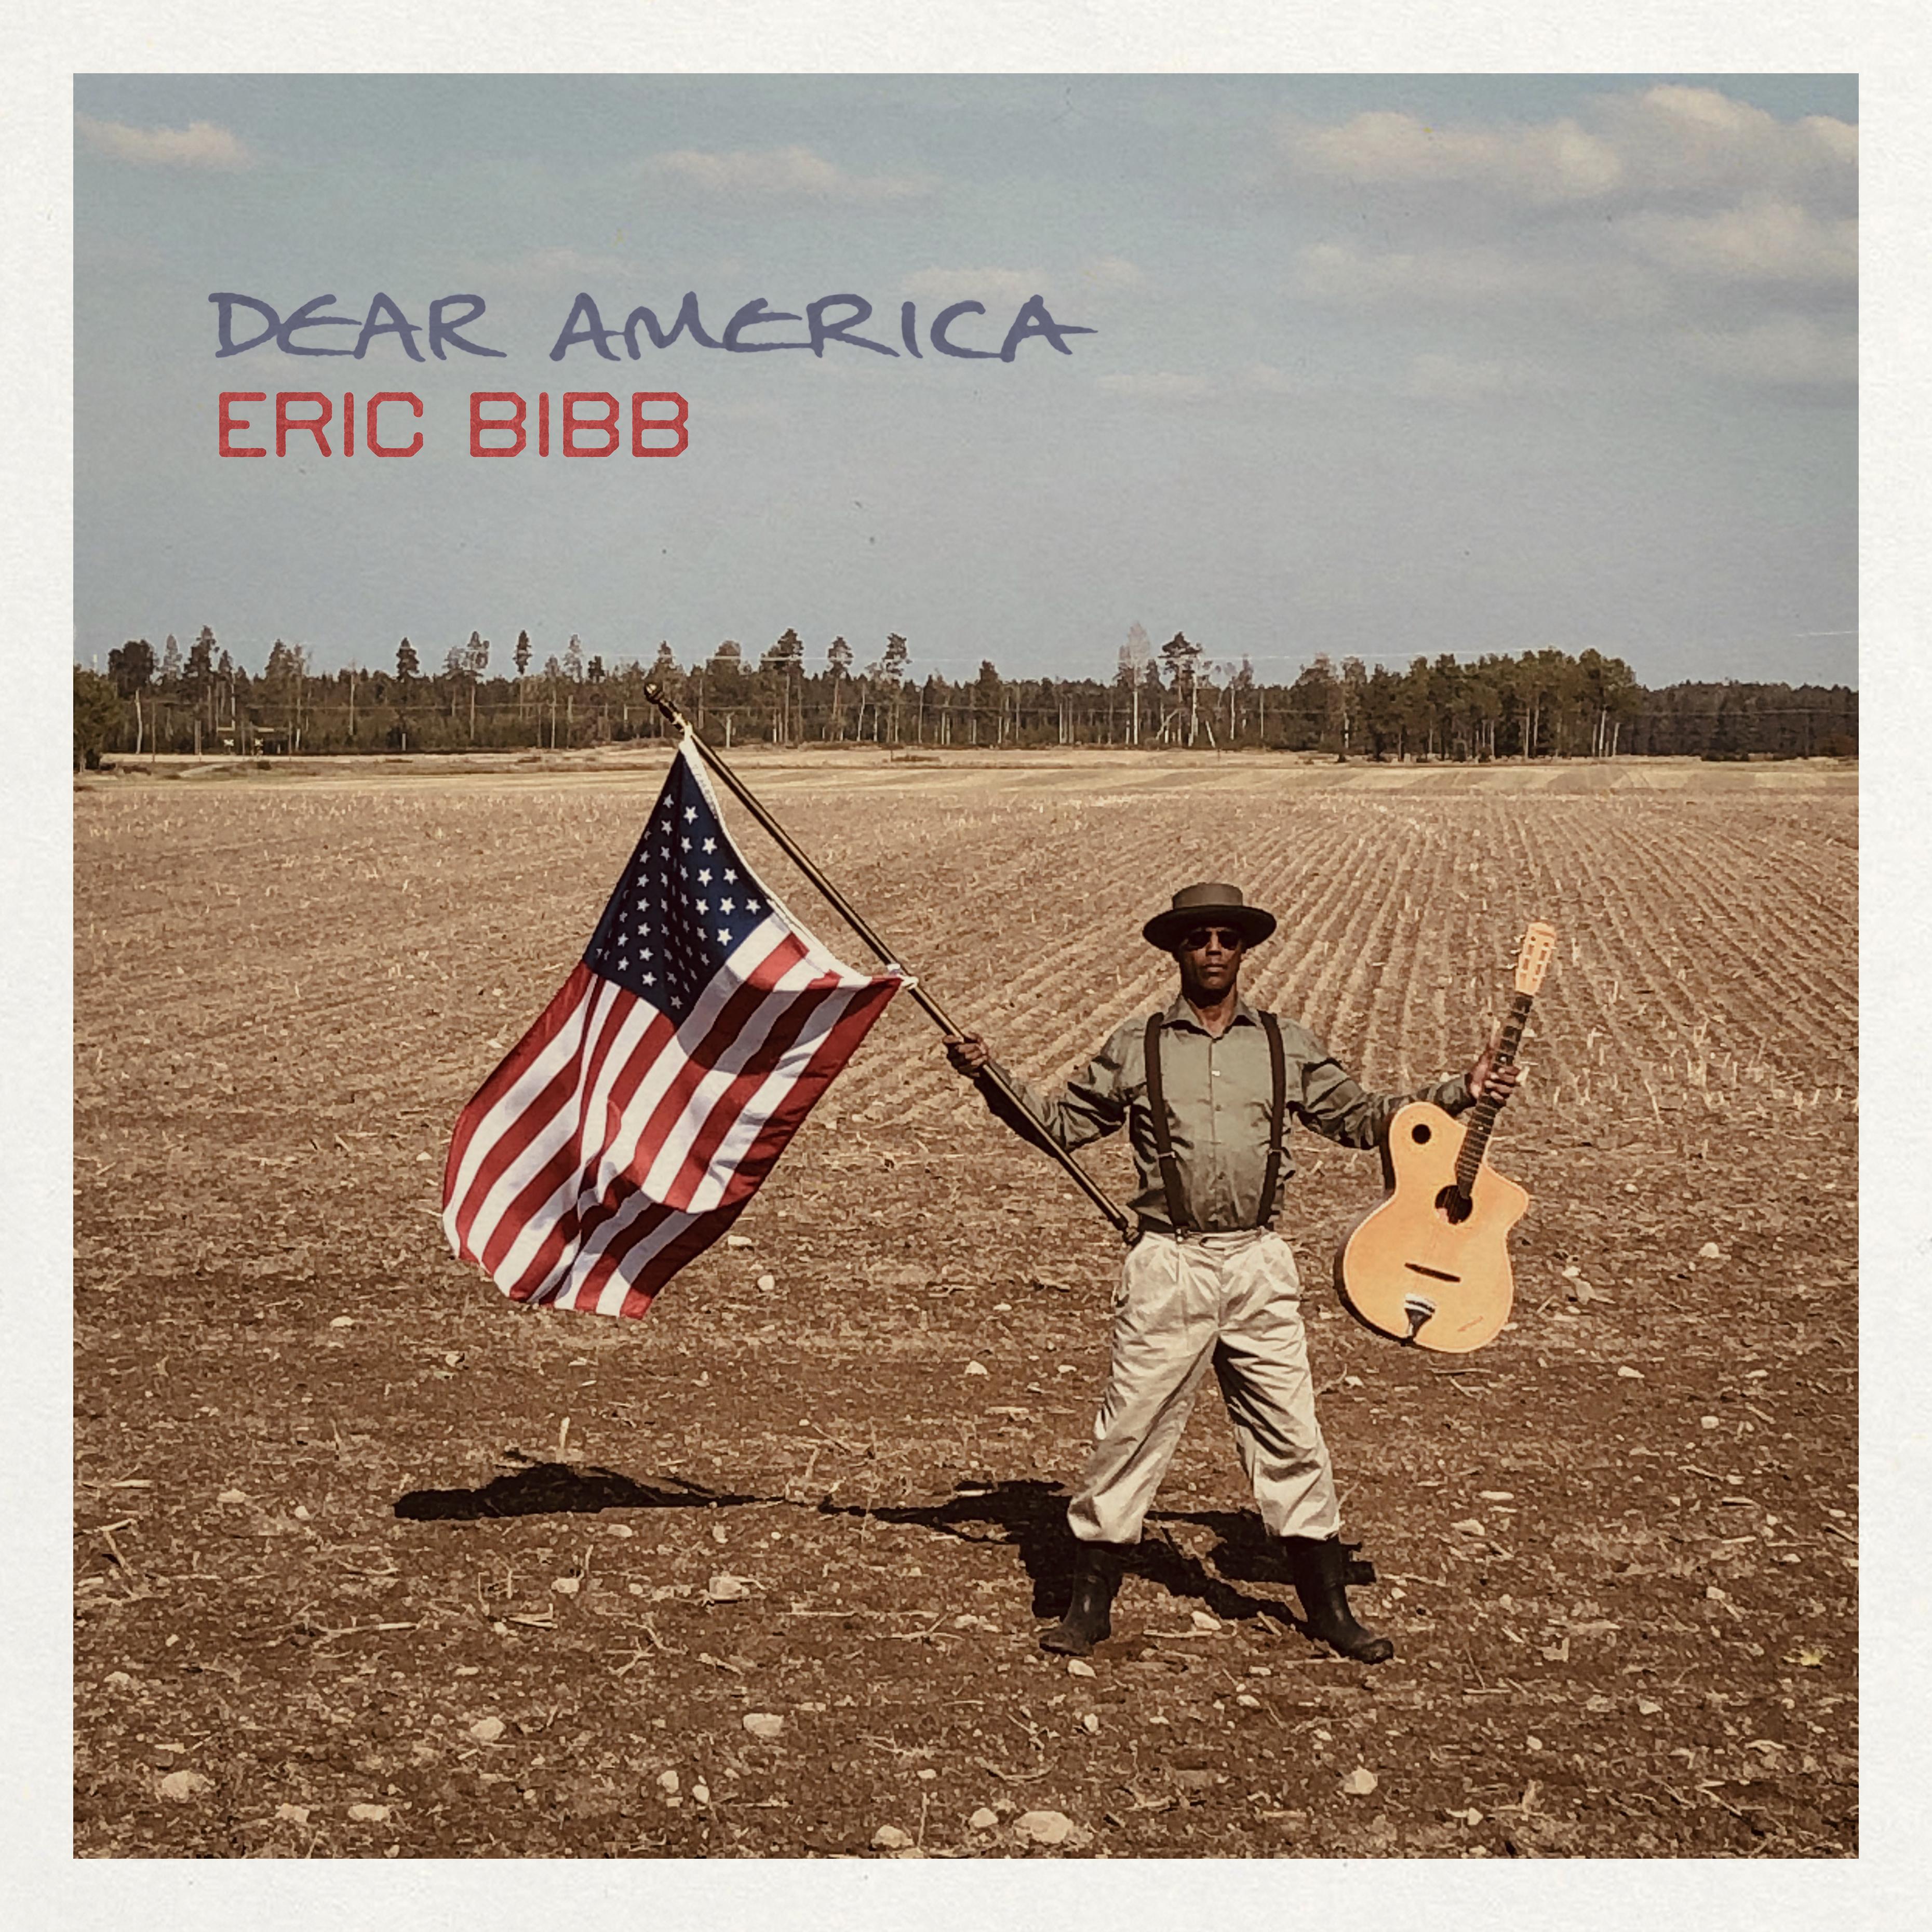 <h5>Eric Bibb<br>Dear America</h5>